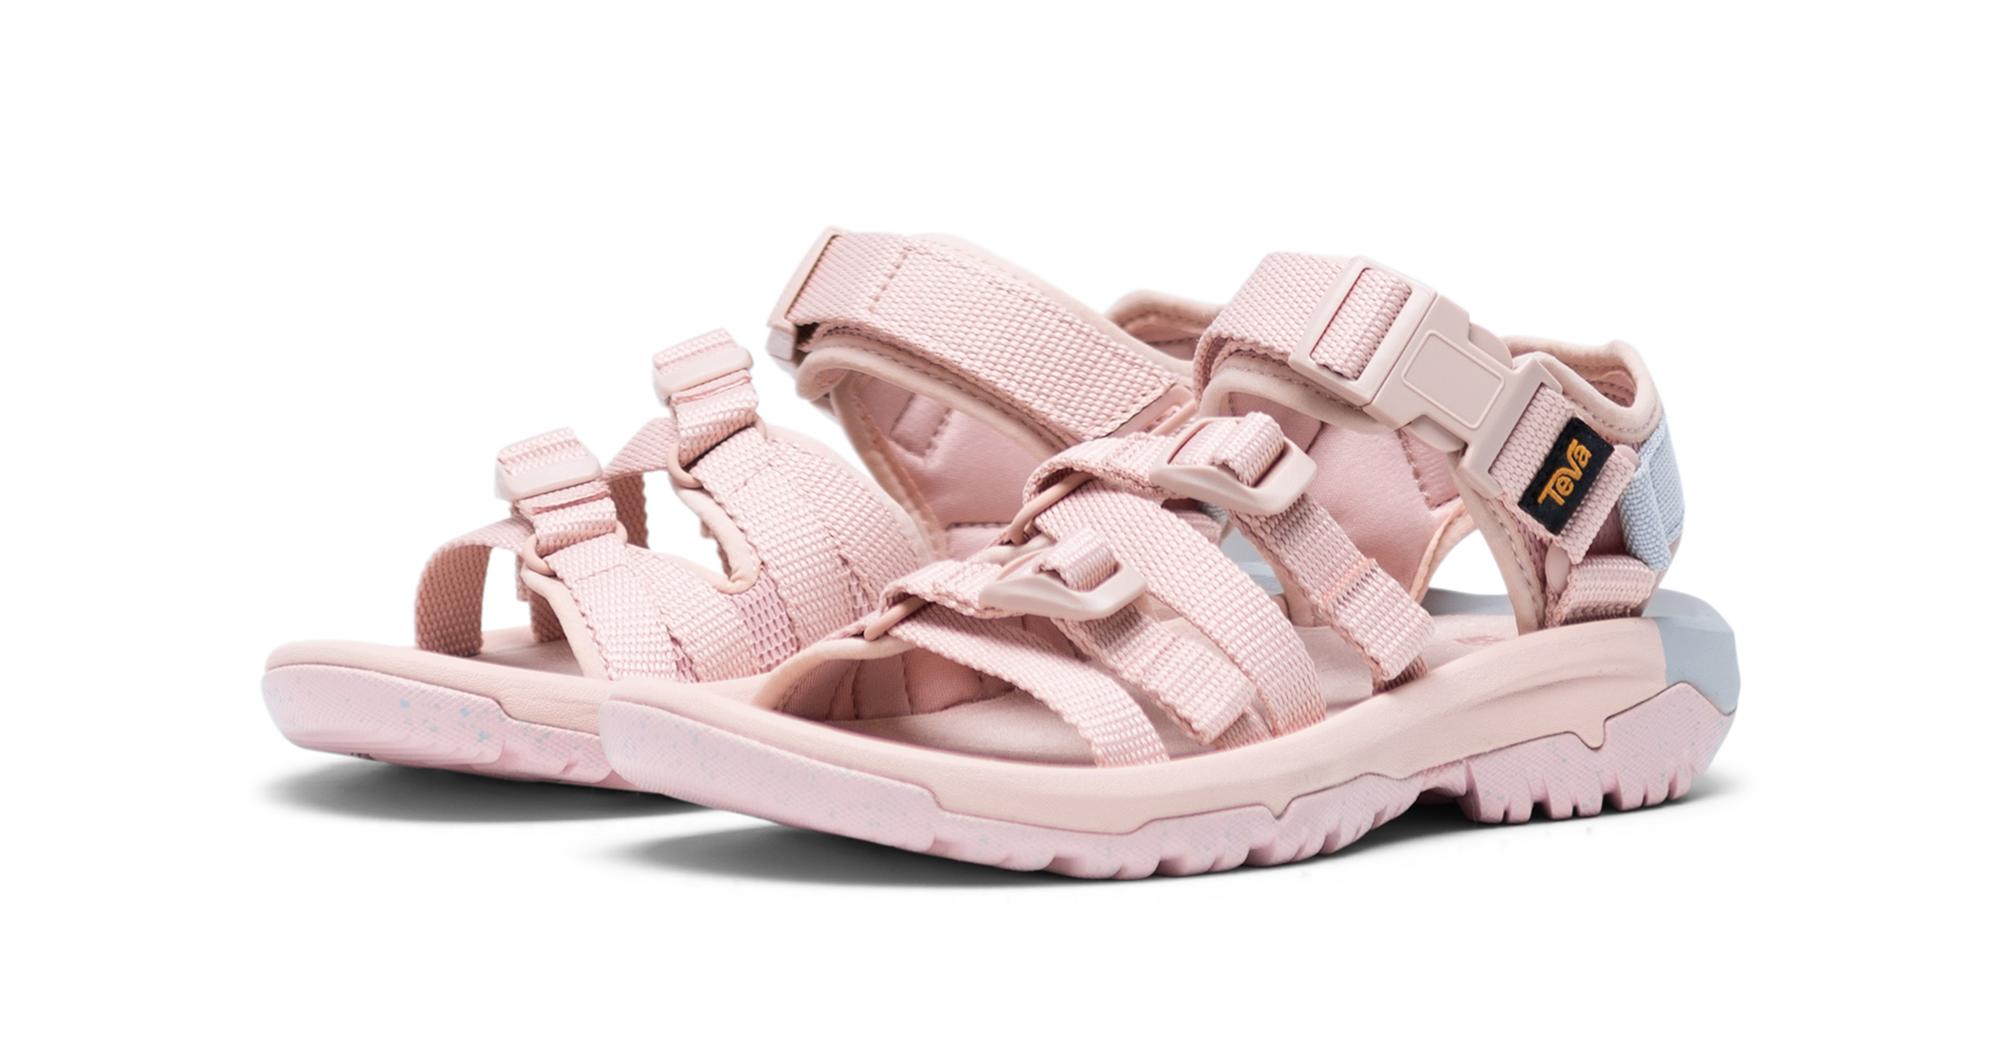 Sandals Designer A Sport Big Trend Like Womens Teva Are KJcTlF1